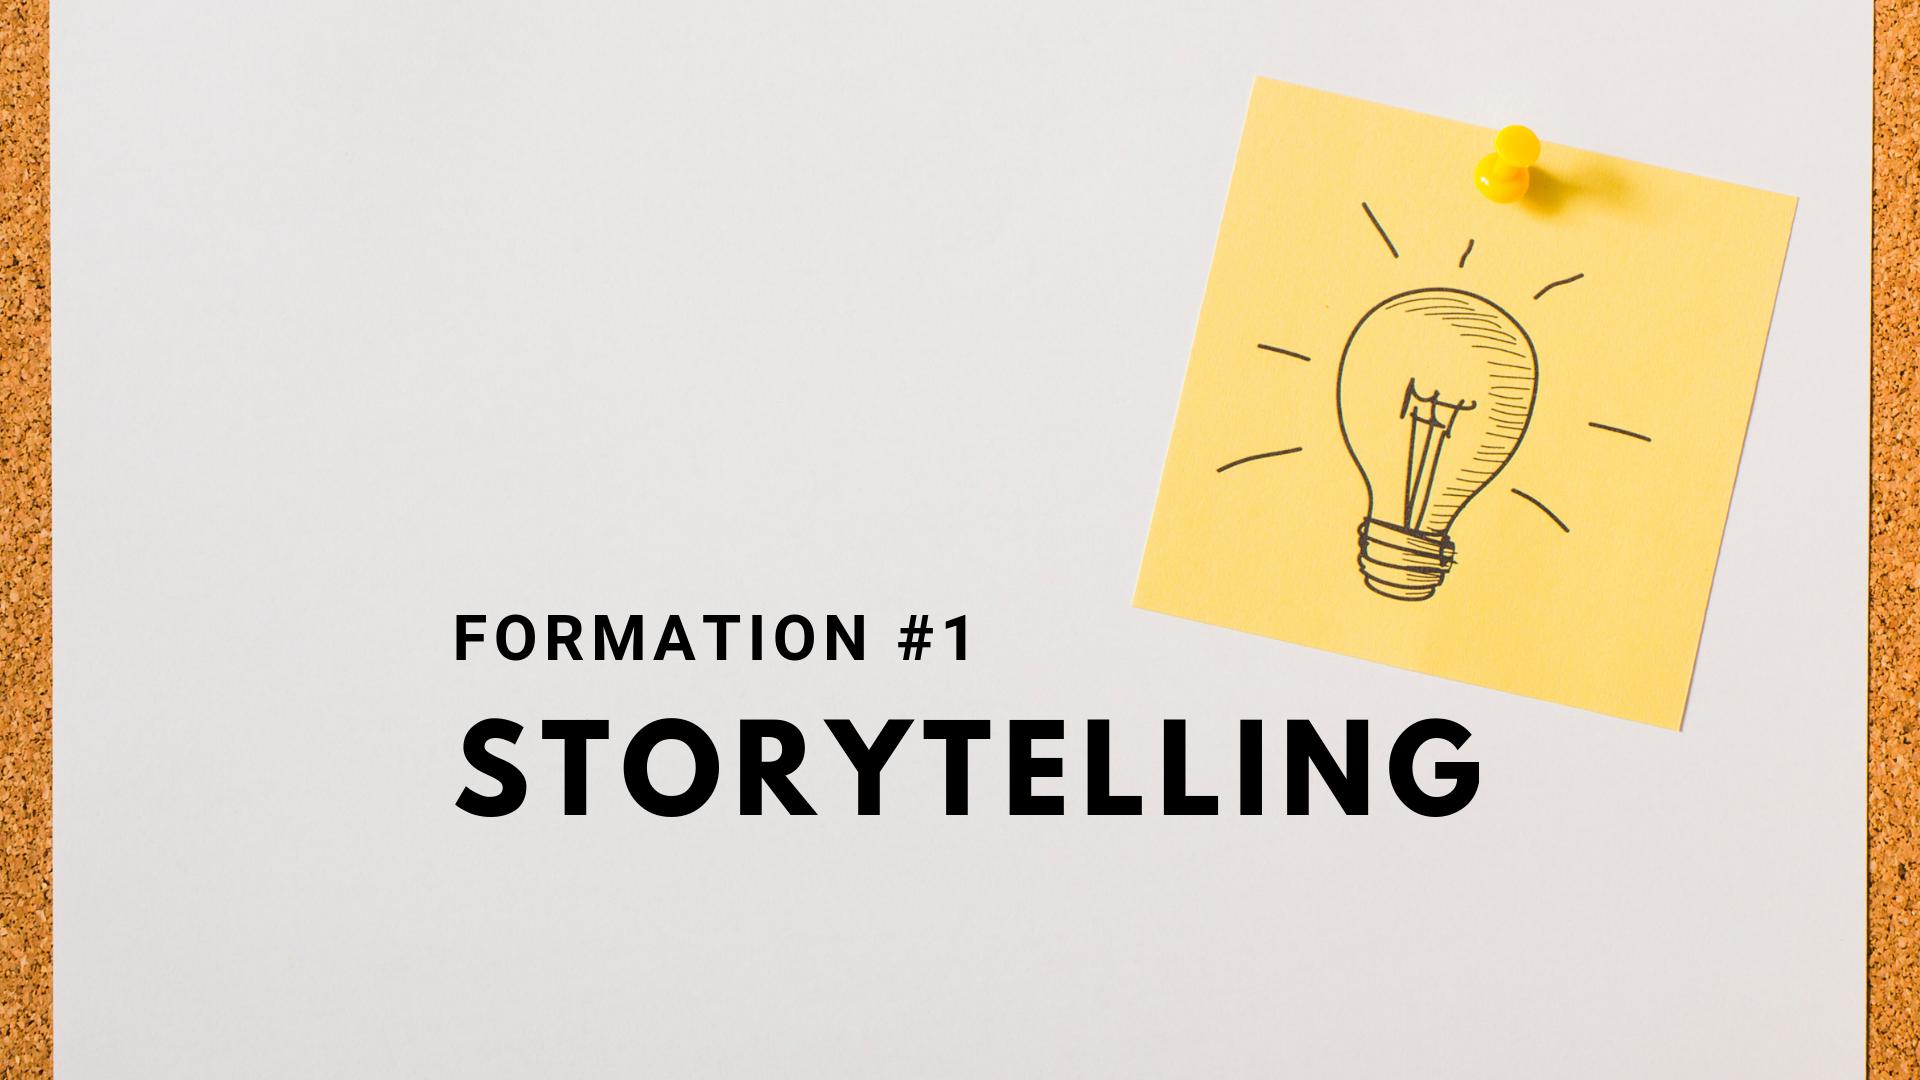 Pourquoi se former au storytelling Grenoble